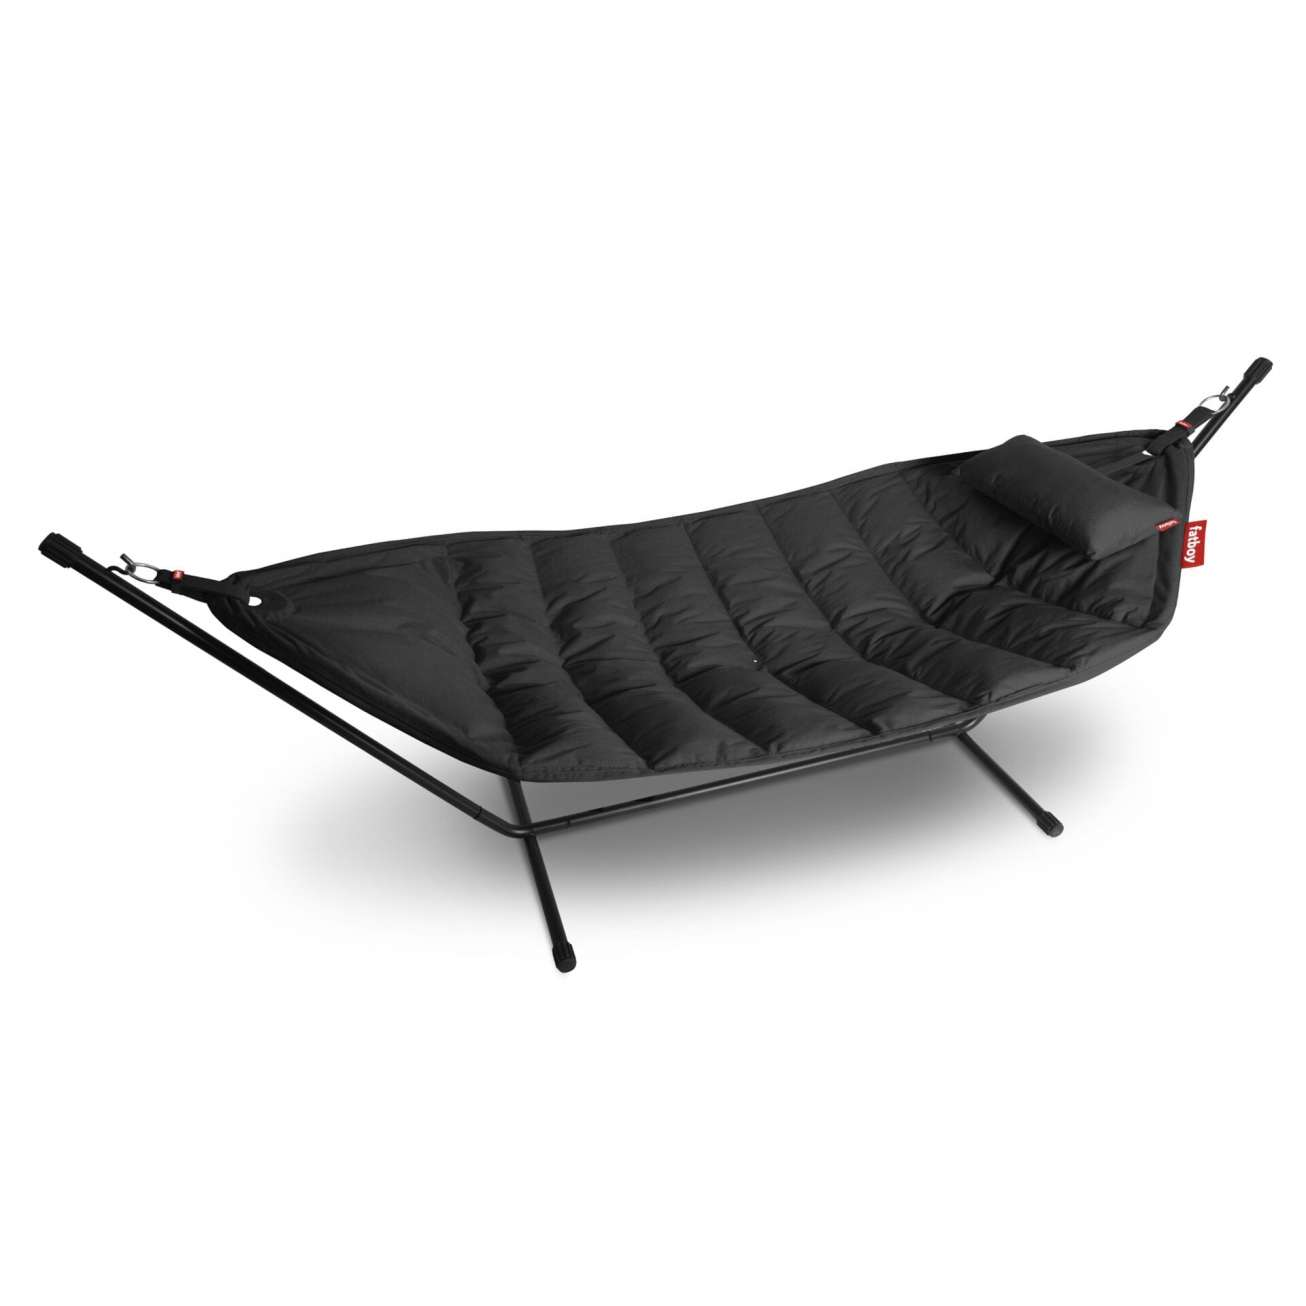 Headdemock_sunbrella_anthracite_103421 Hagemøbler og utemøbler - Fine design